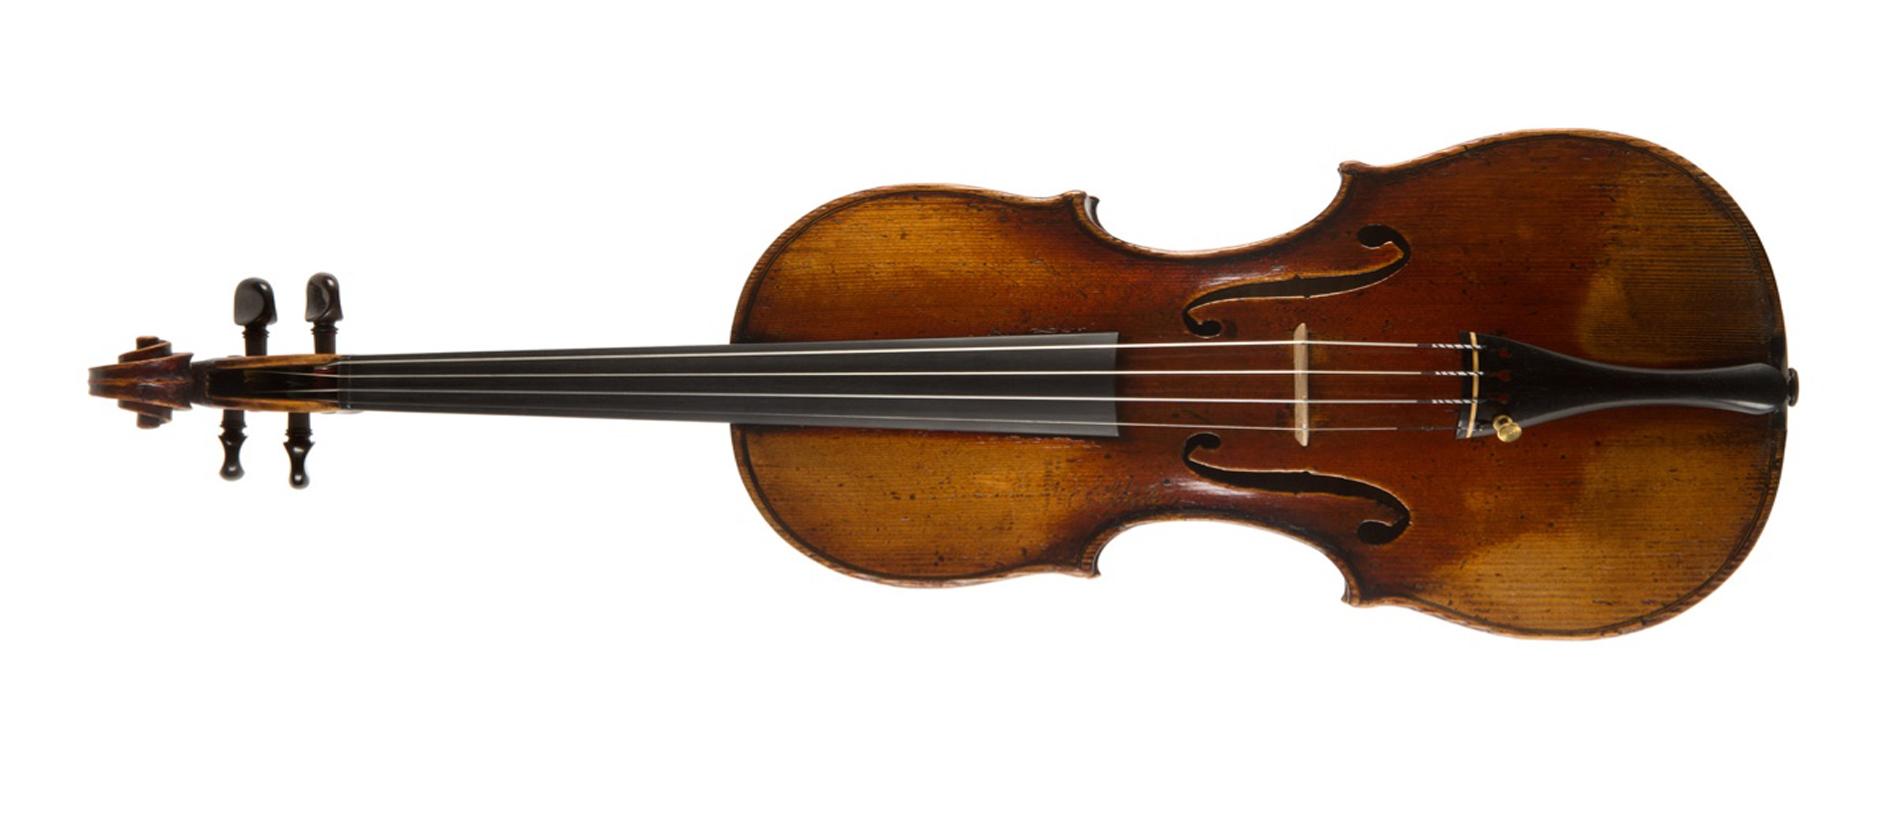 Eckhardt-Gramatté Joachim George Chanot violin